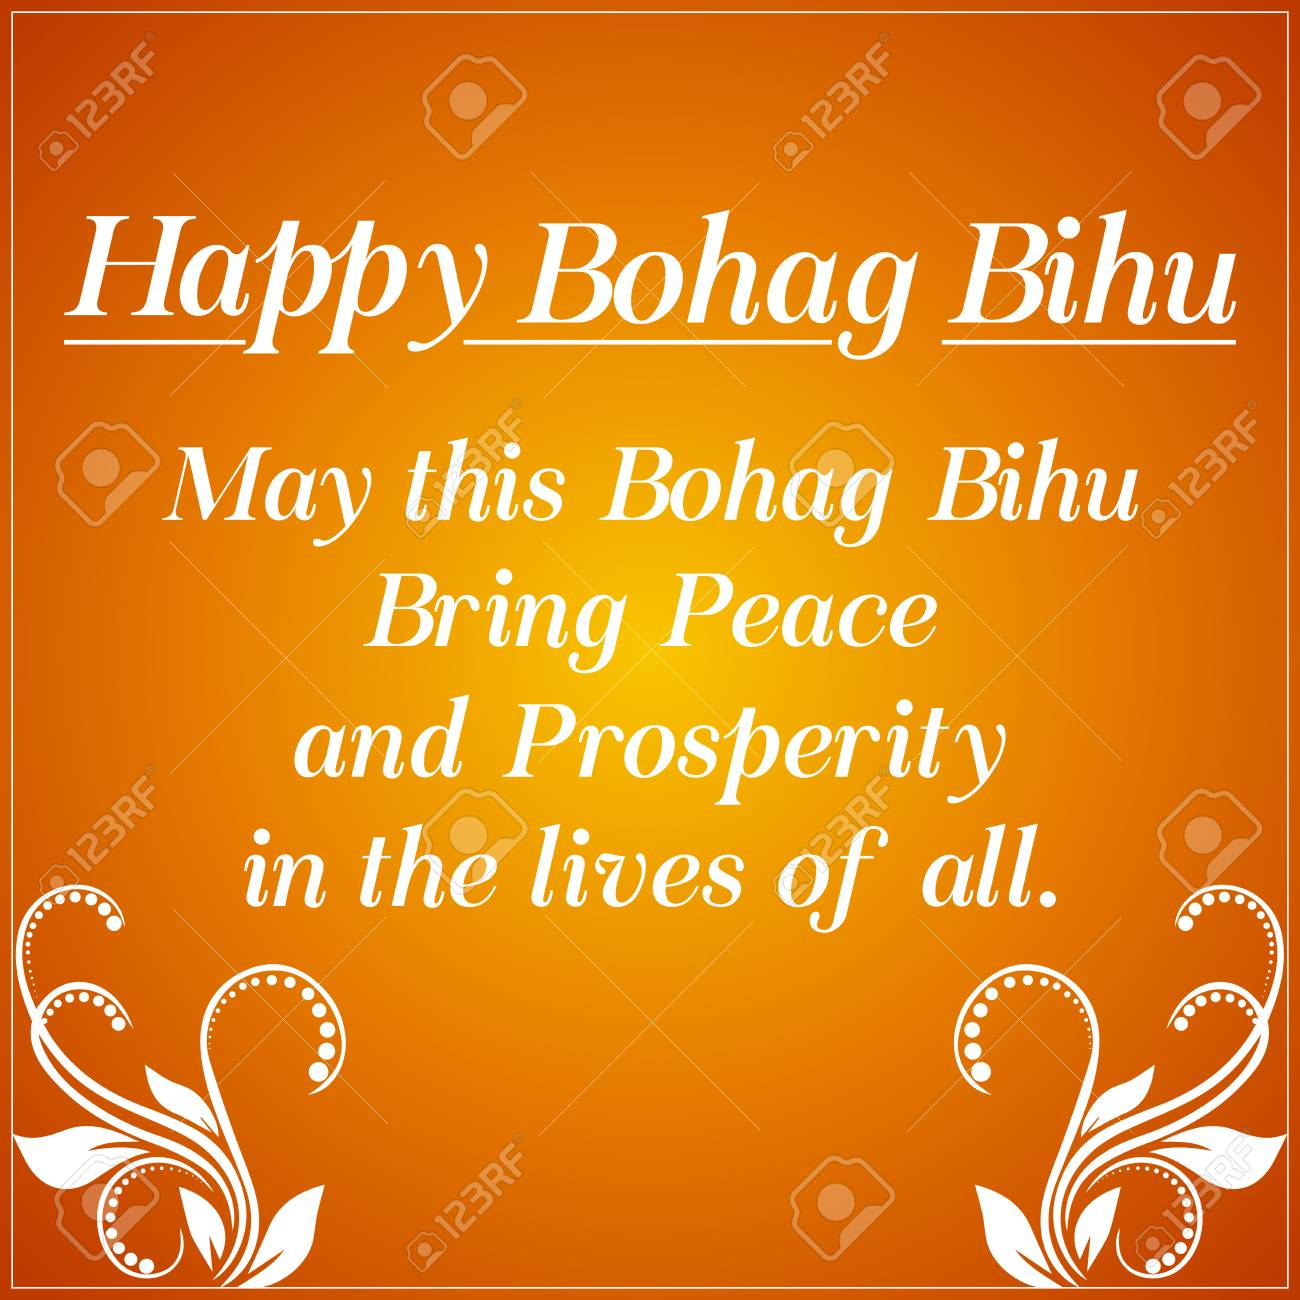 Creative Greetings For Bohag Bihu With Nice And Creative Design